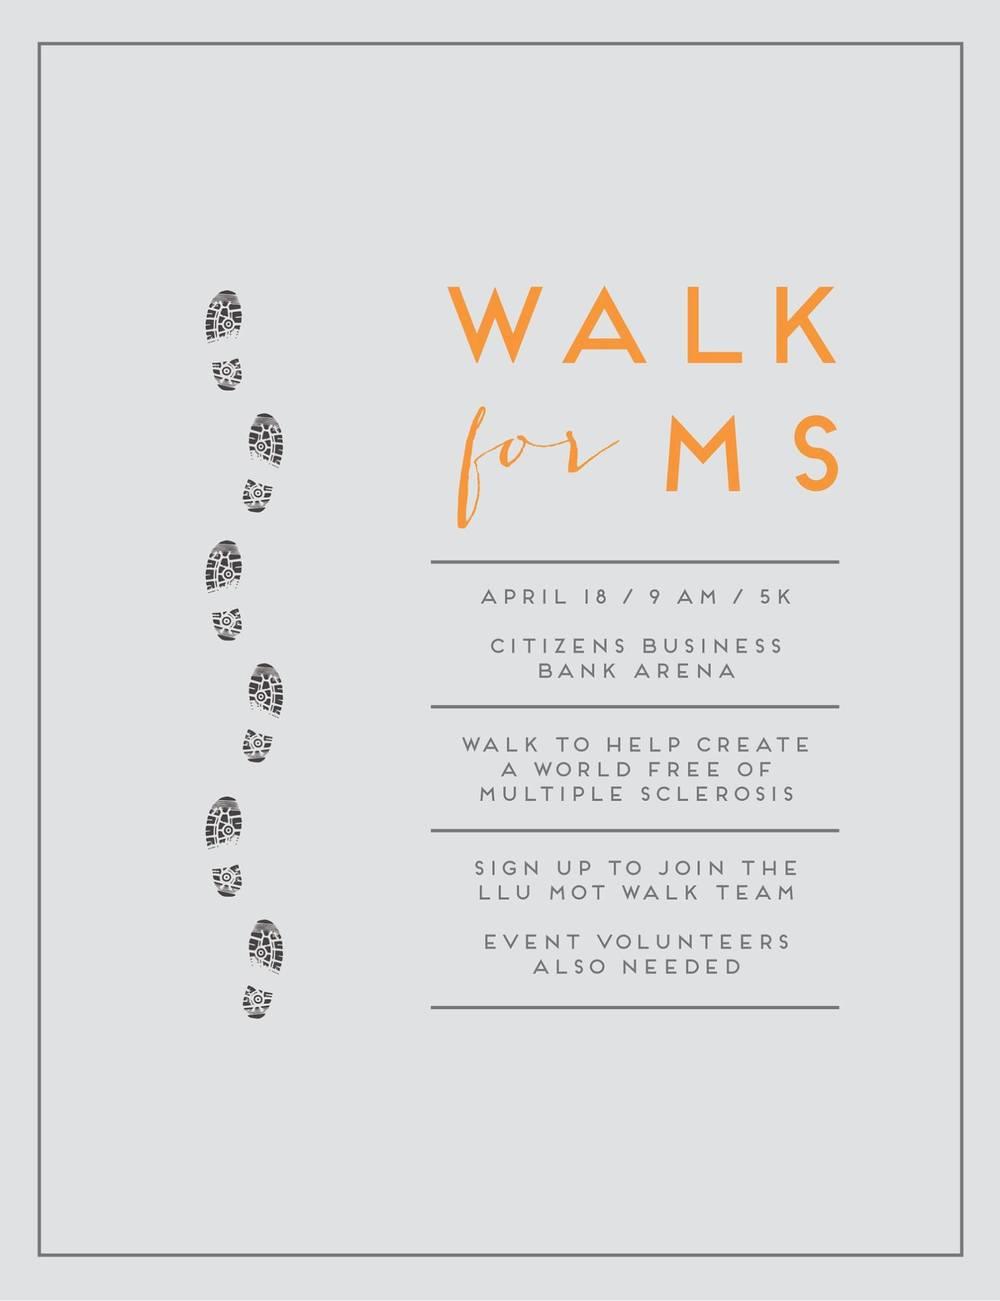 walkforms.jpg